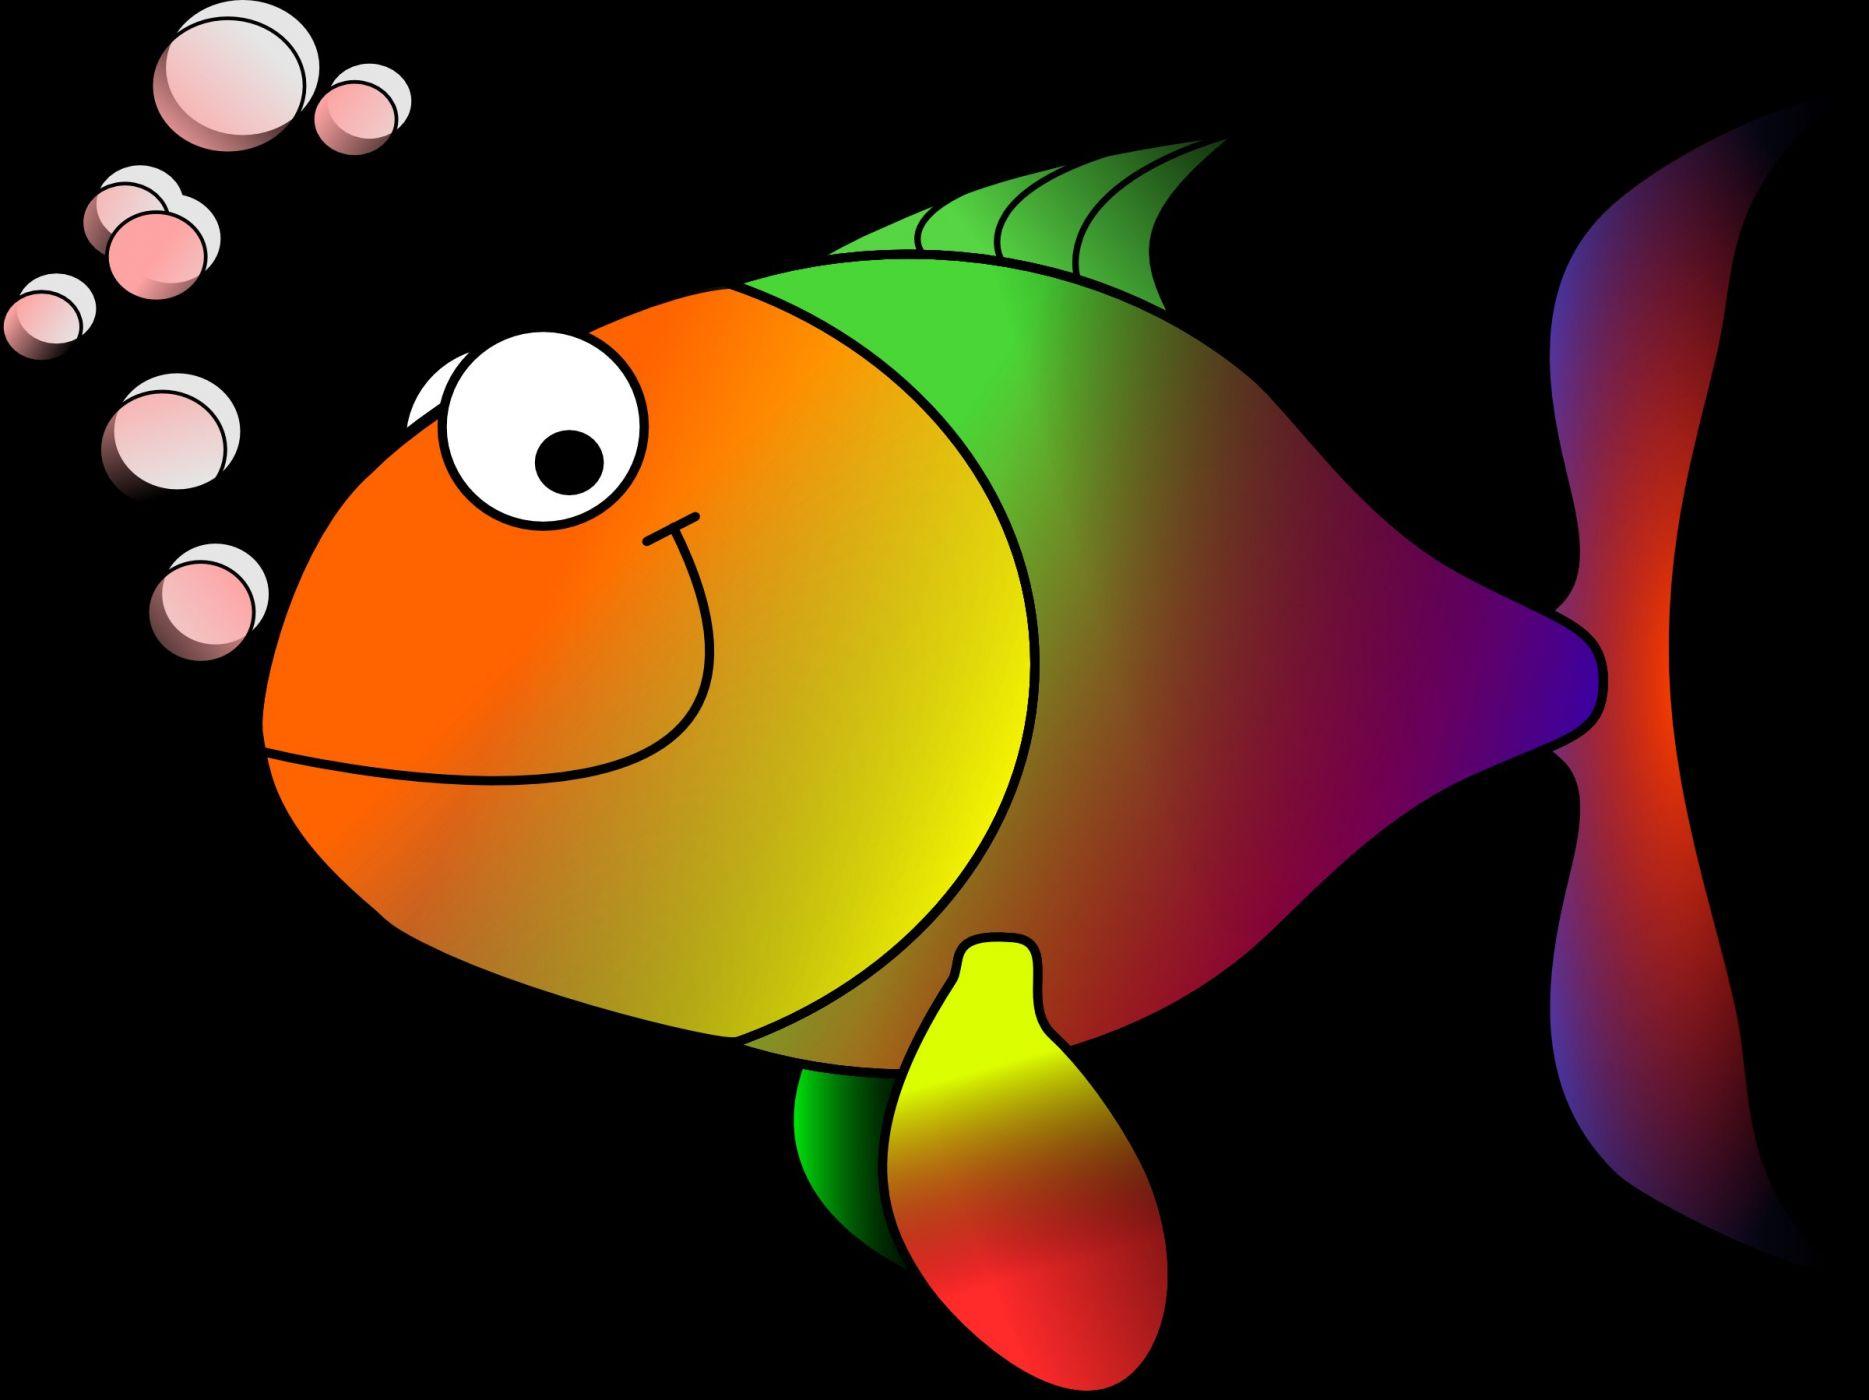 Лезгинские приколы, веселые картинки про рыбу